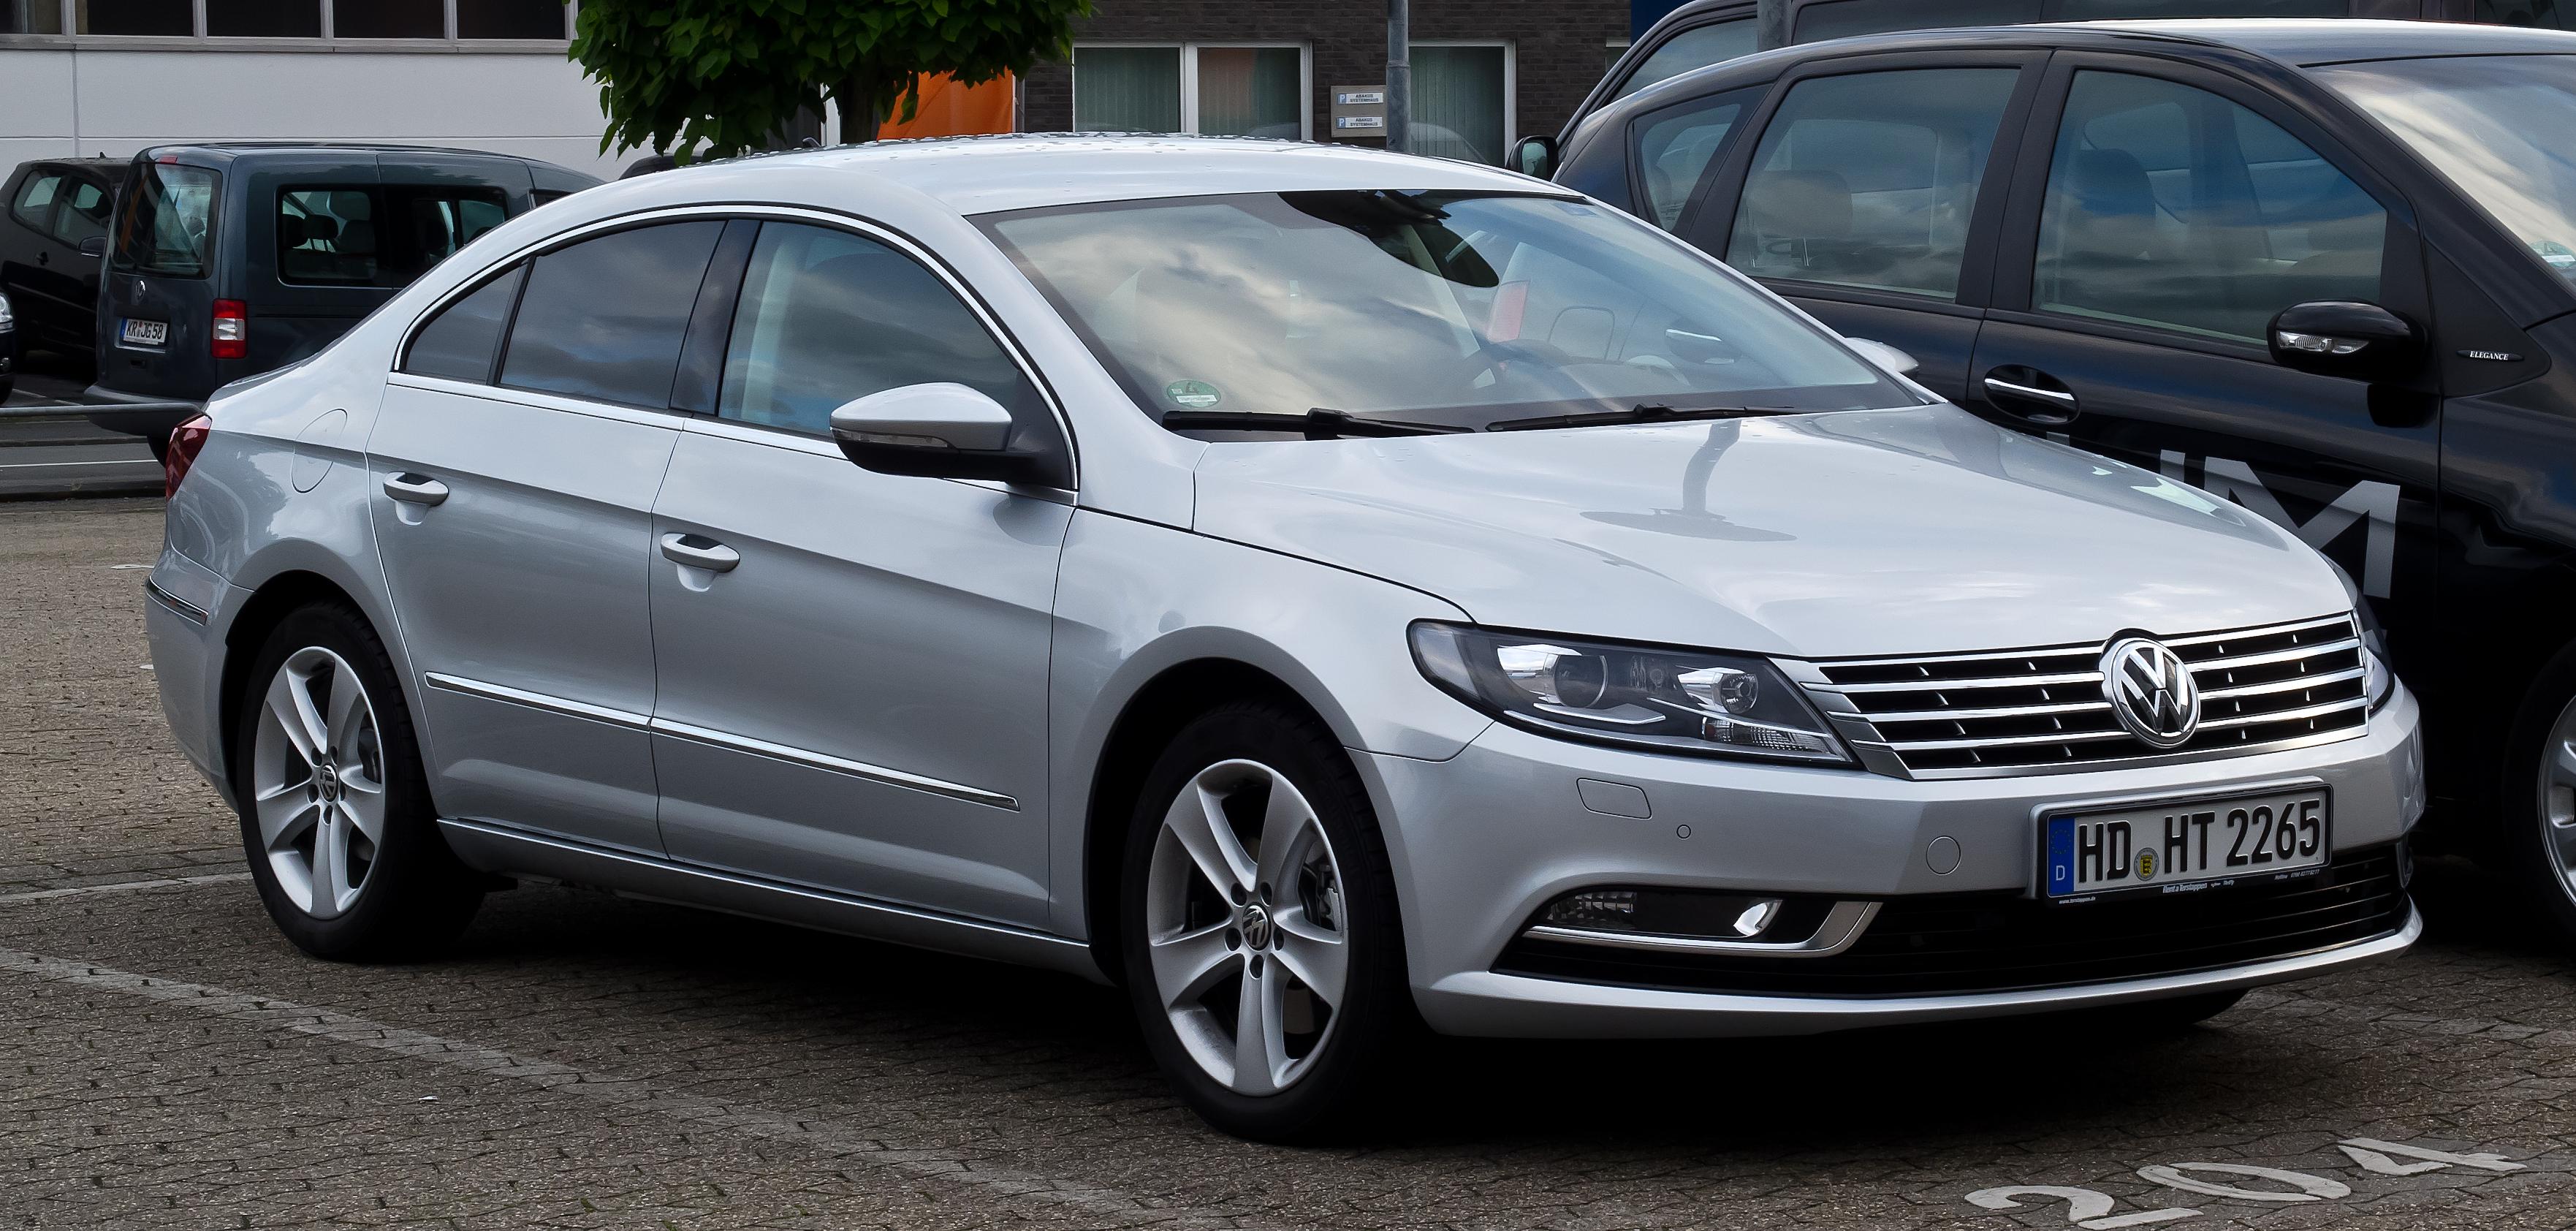 File:Volkswagen CC 2.0 TDI BlueMotion Technology (Facelift